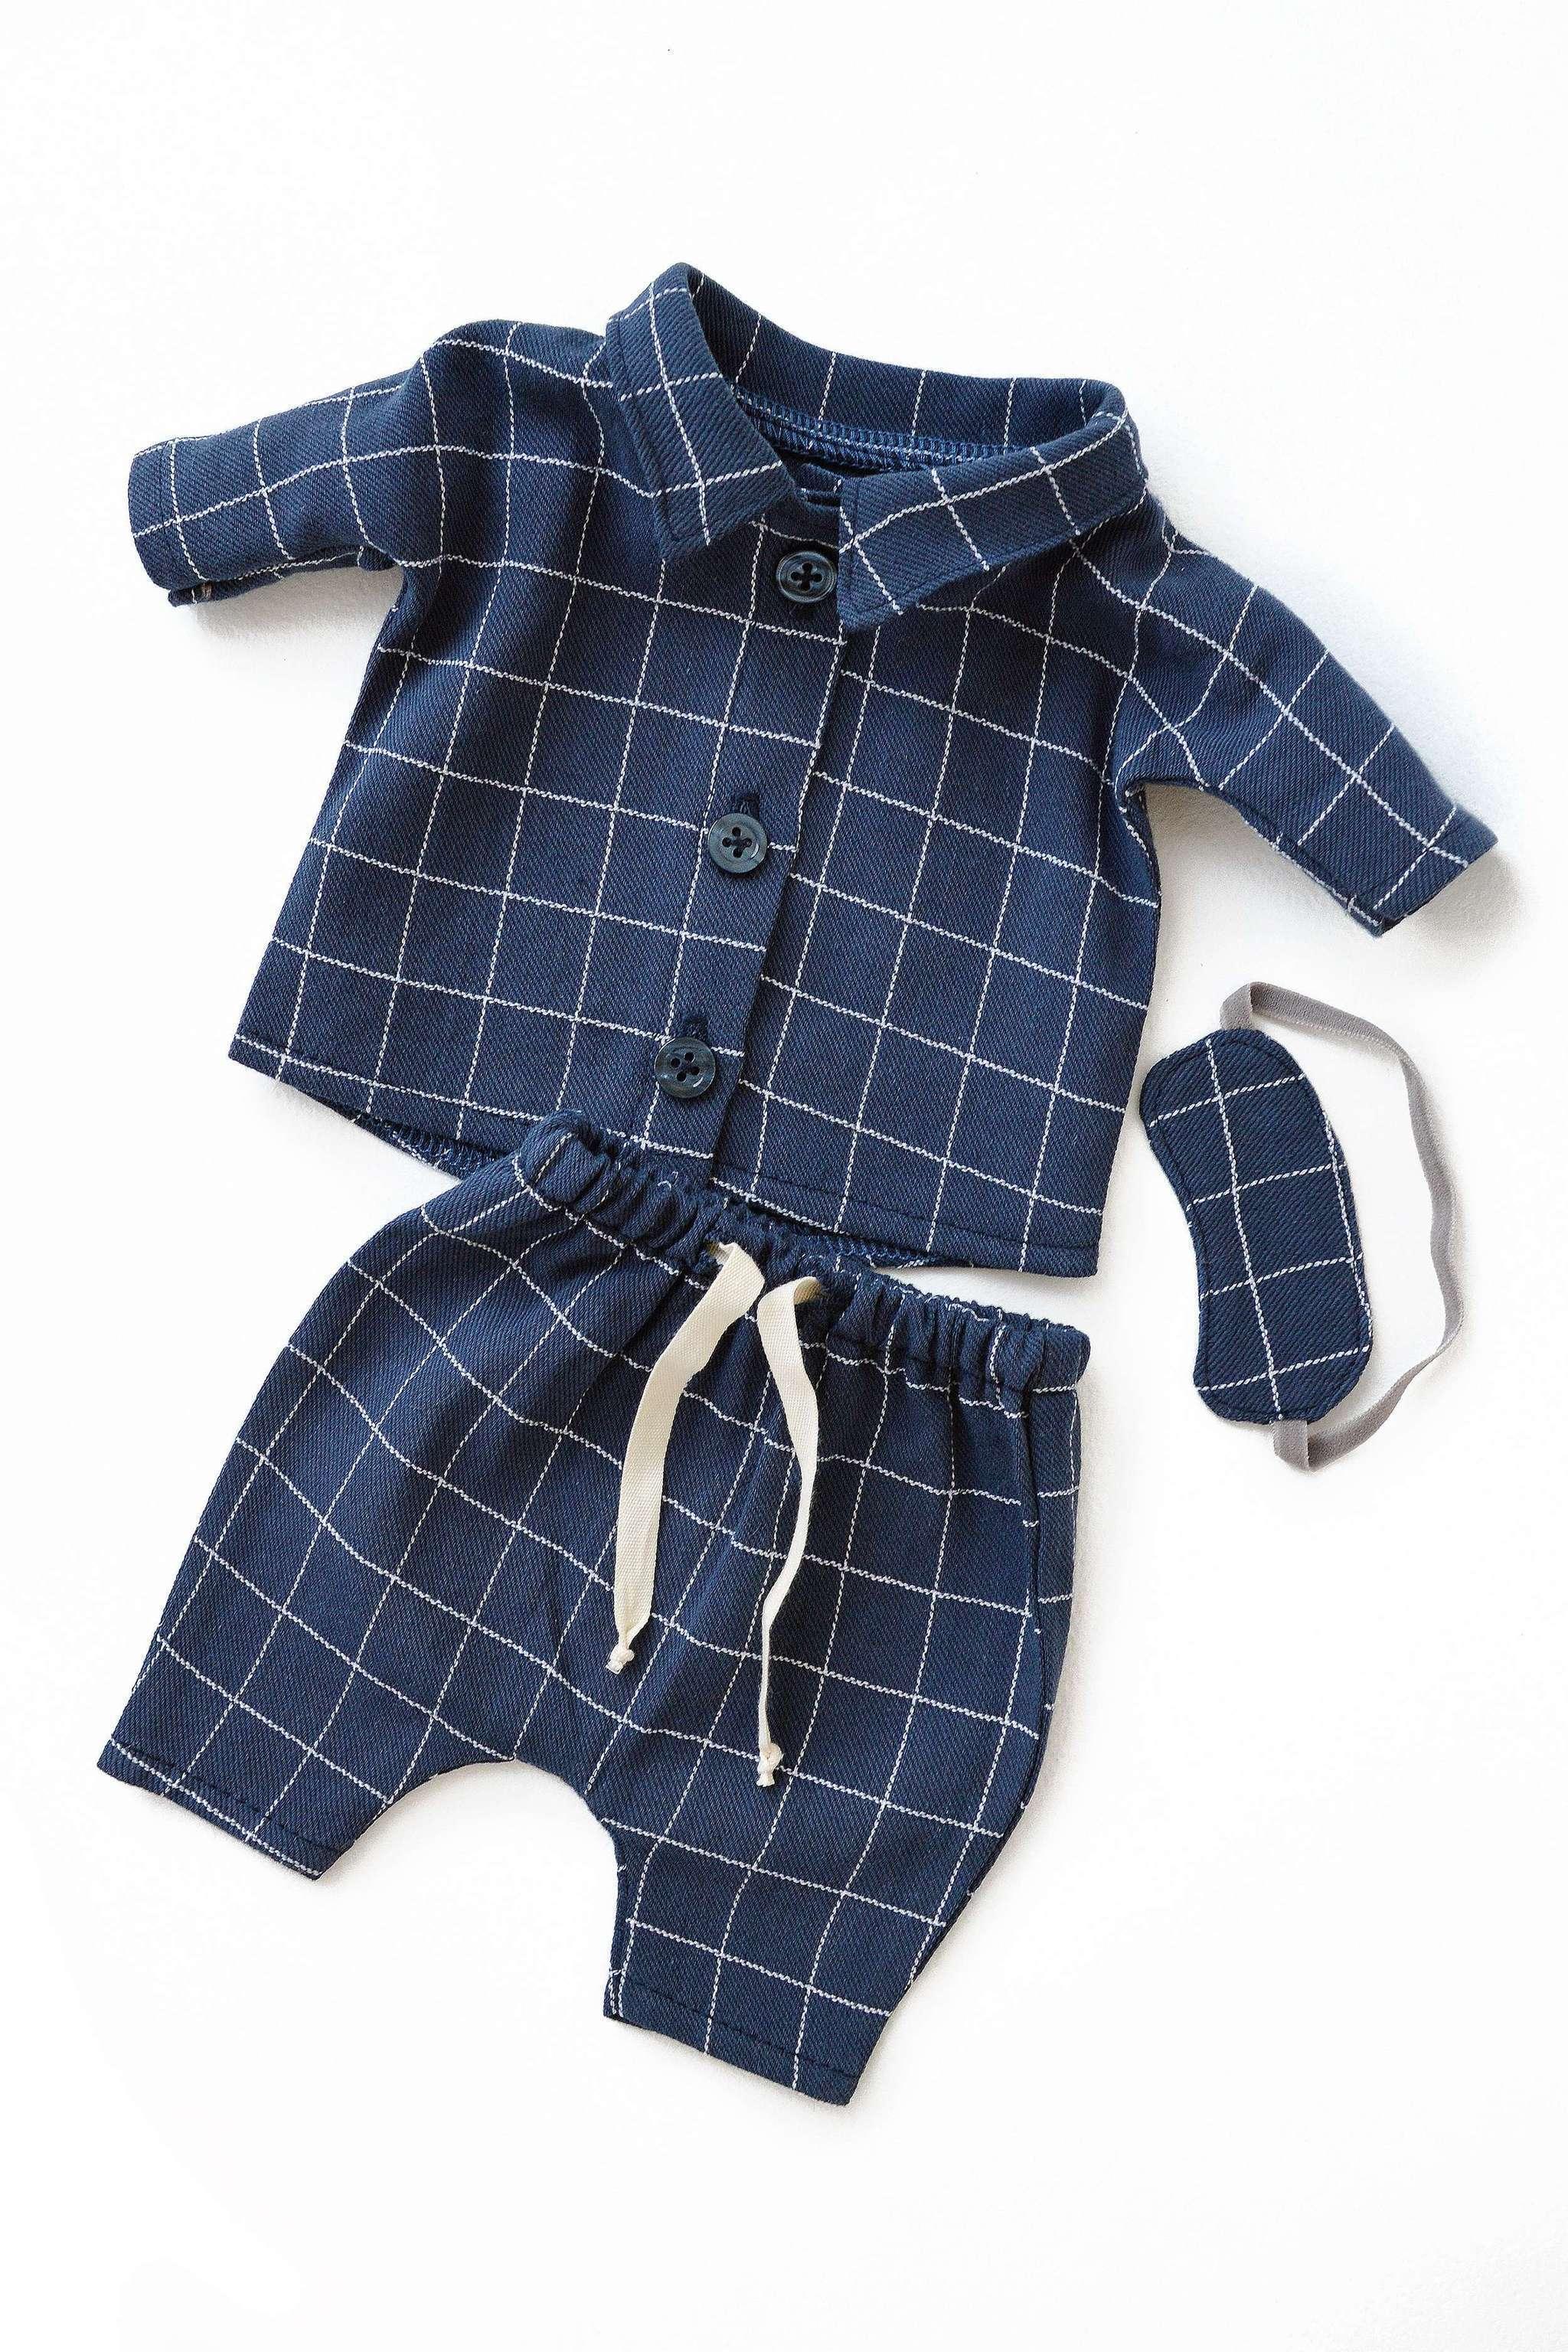 Pyjamas-sett blårutet (Philomena Kloss)